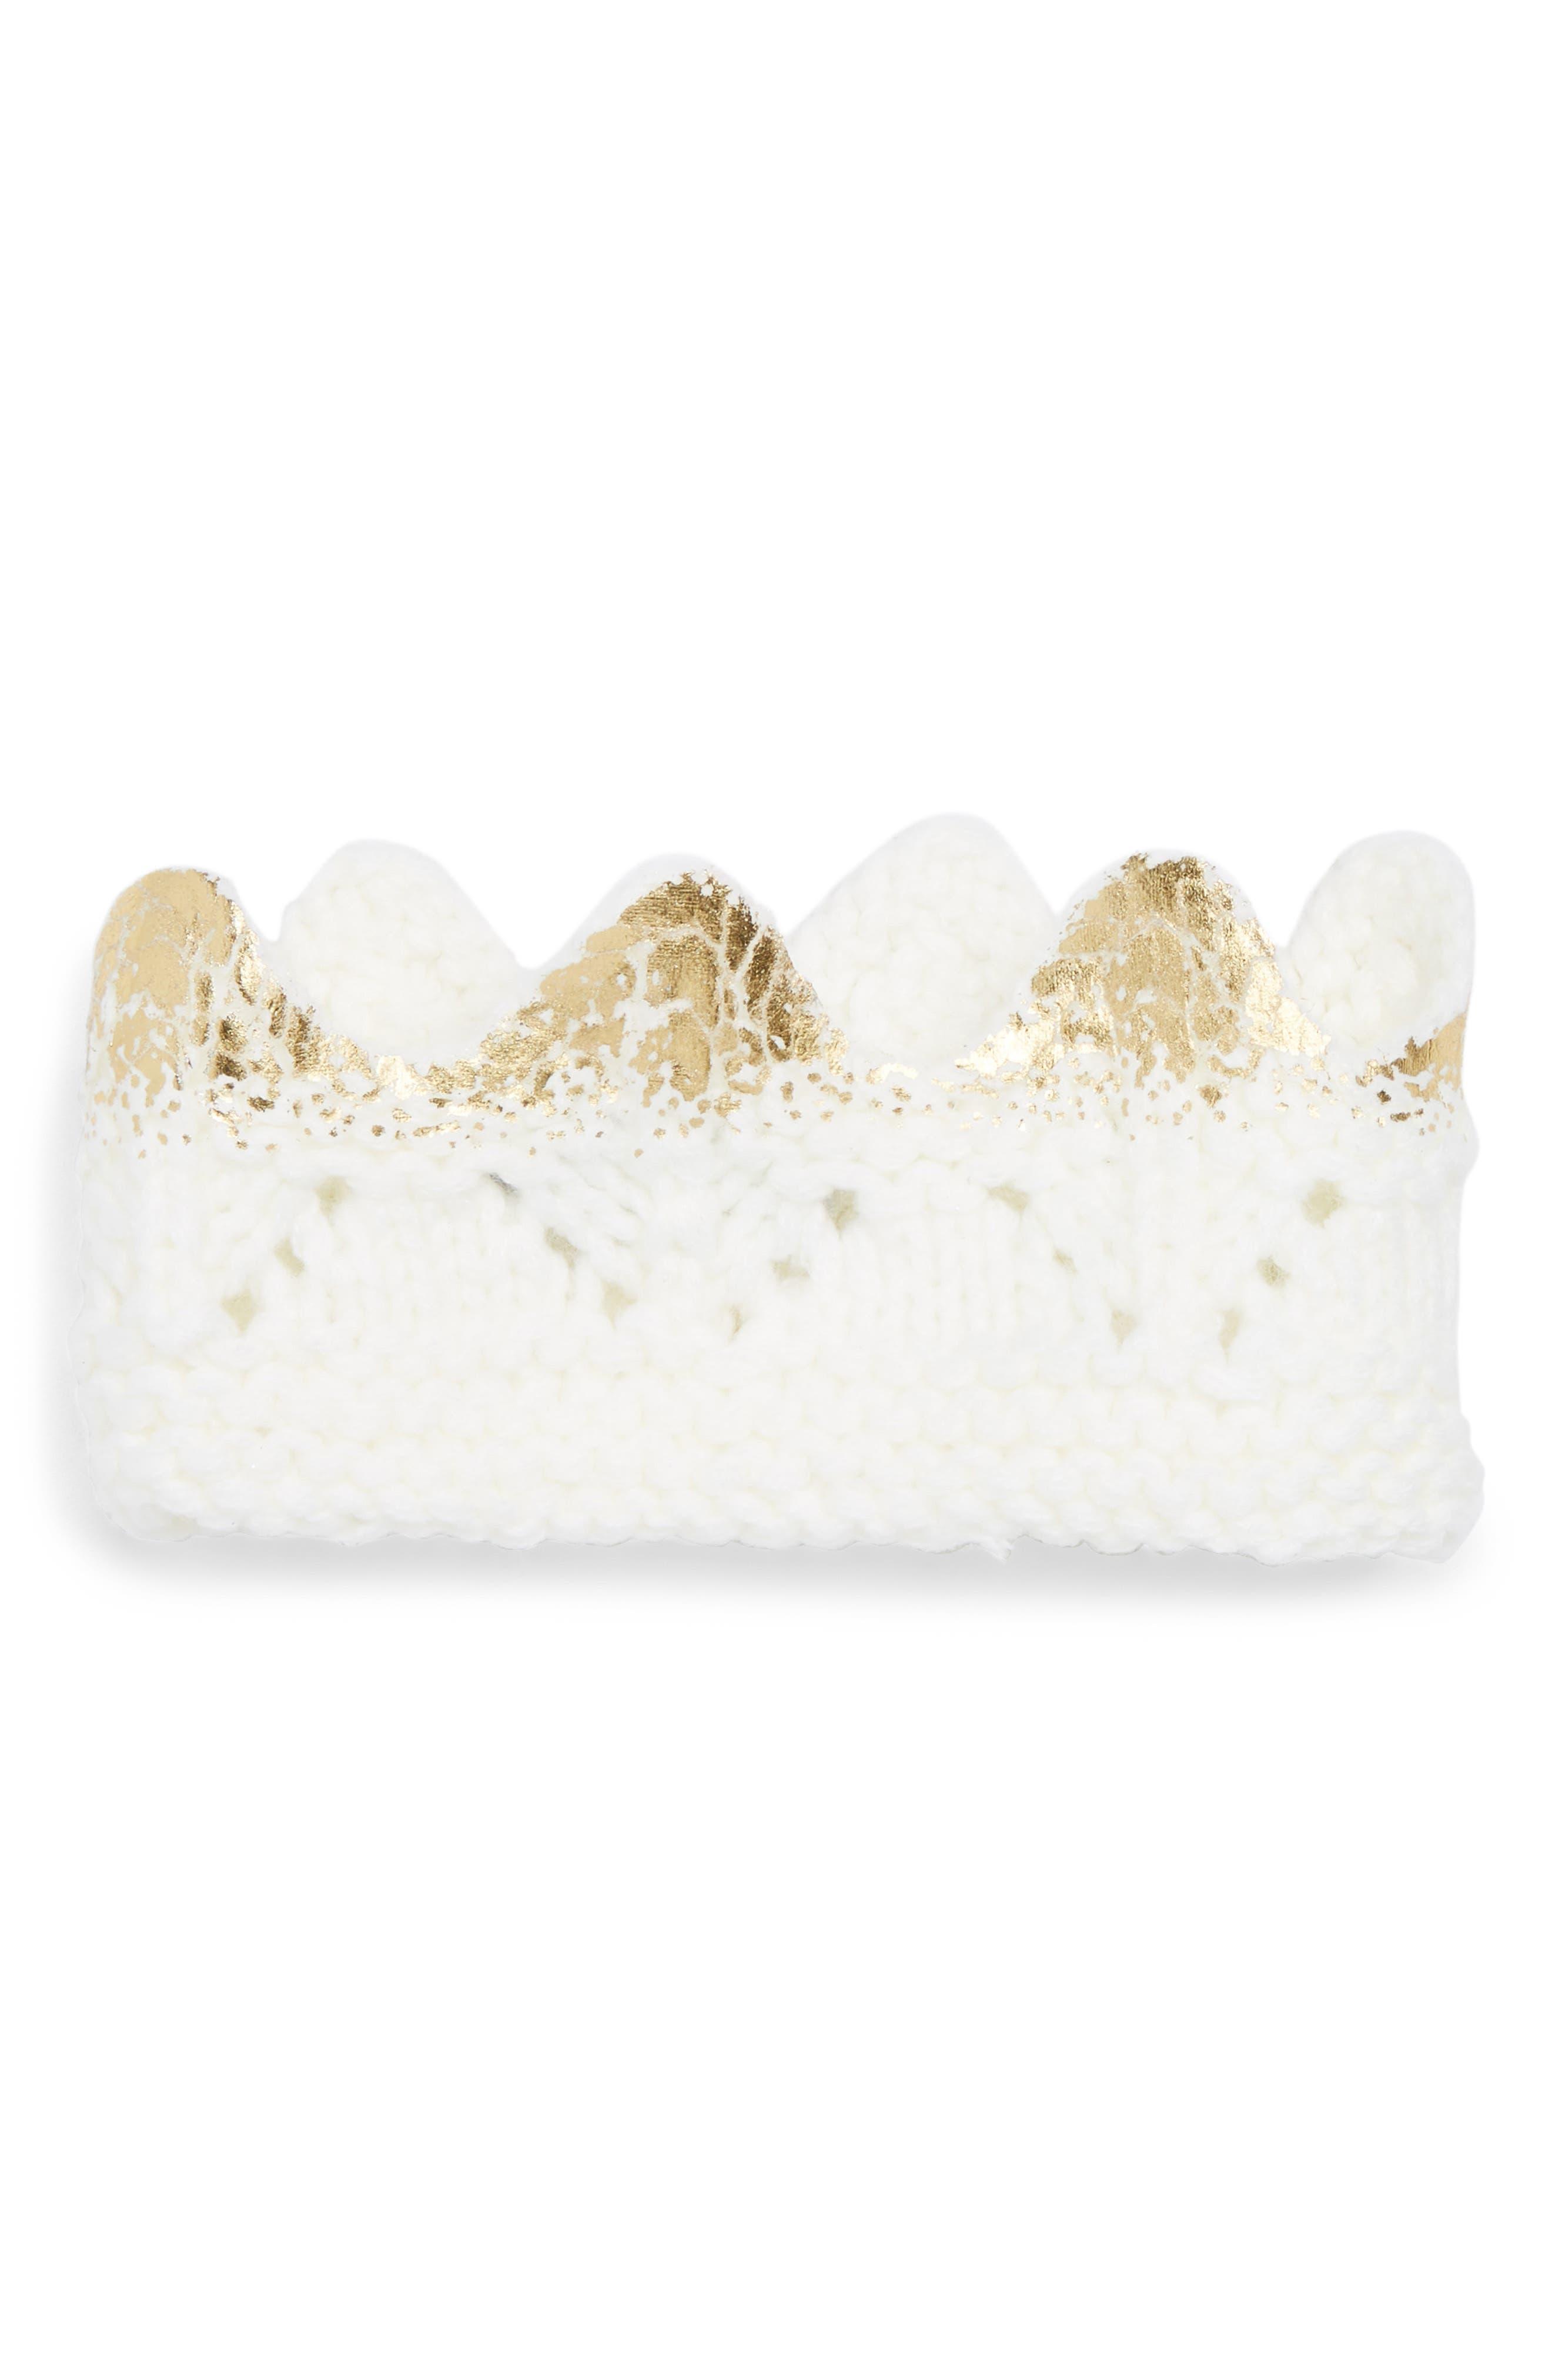 Aiden Knit Crown,                             Main thumbnail 1, color,                             902